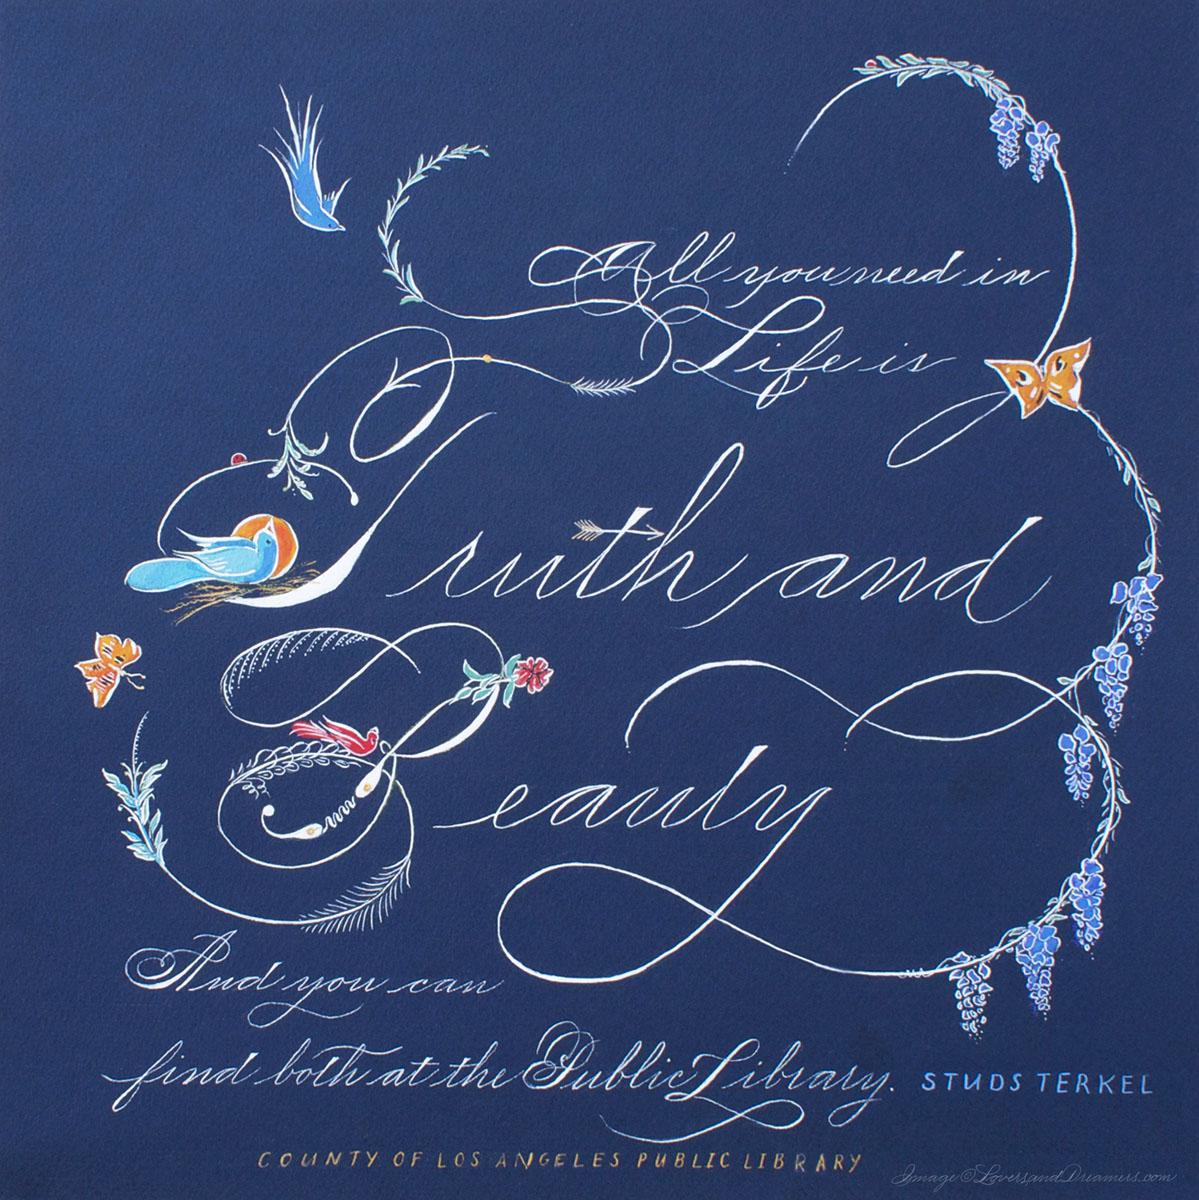 Kelly-Chilton-Calligrafile-04.jpg